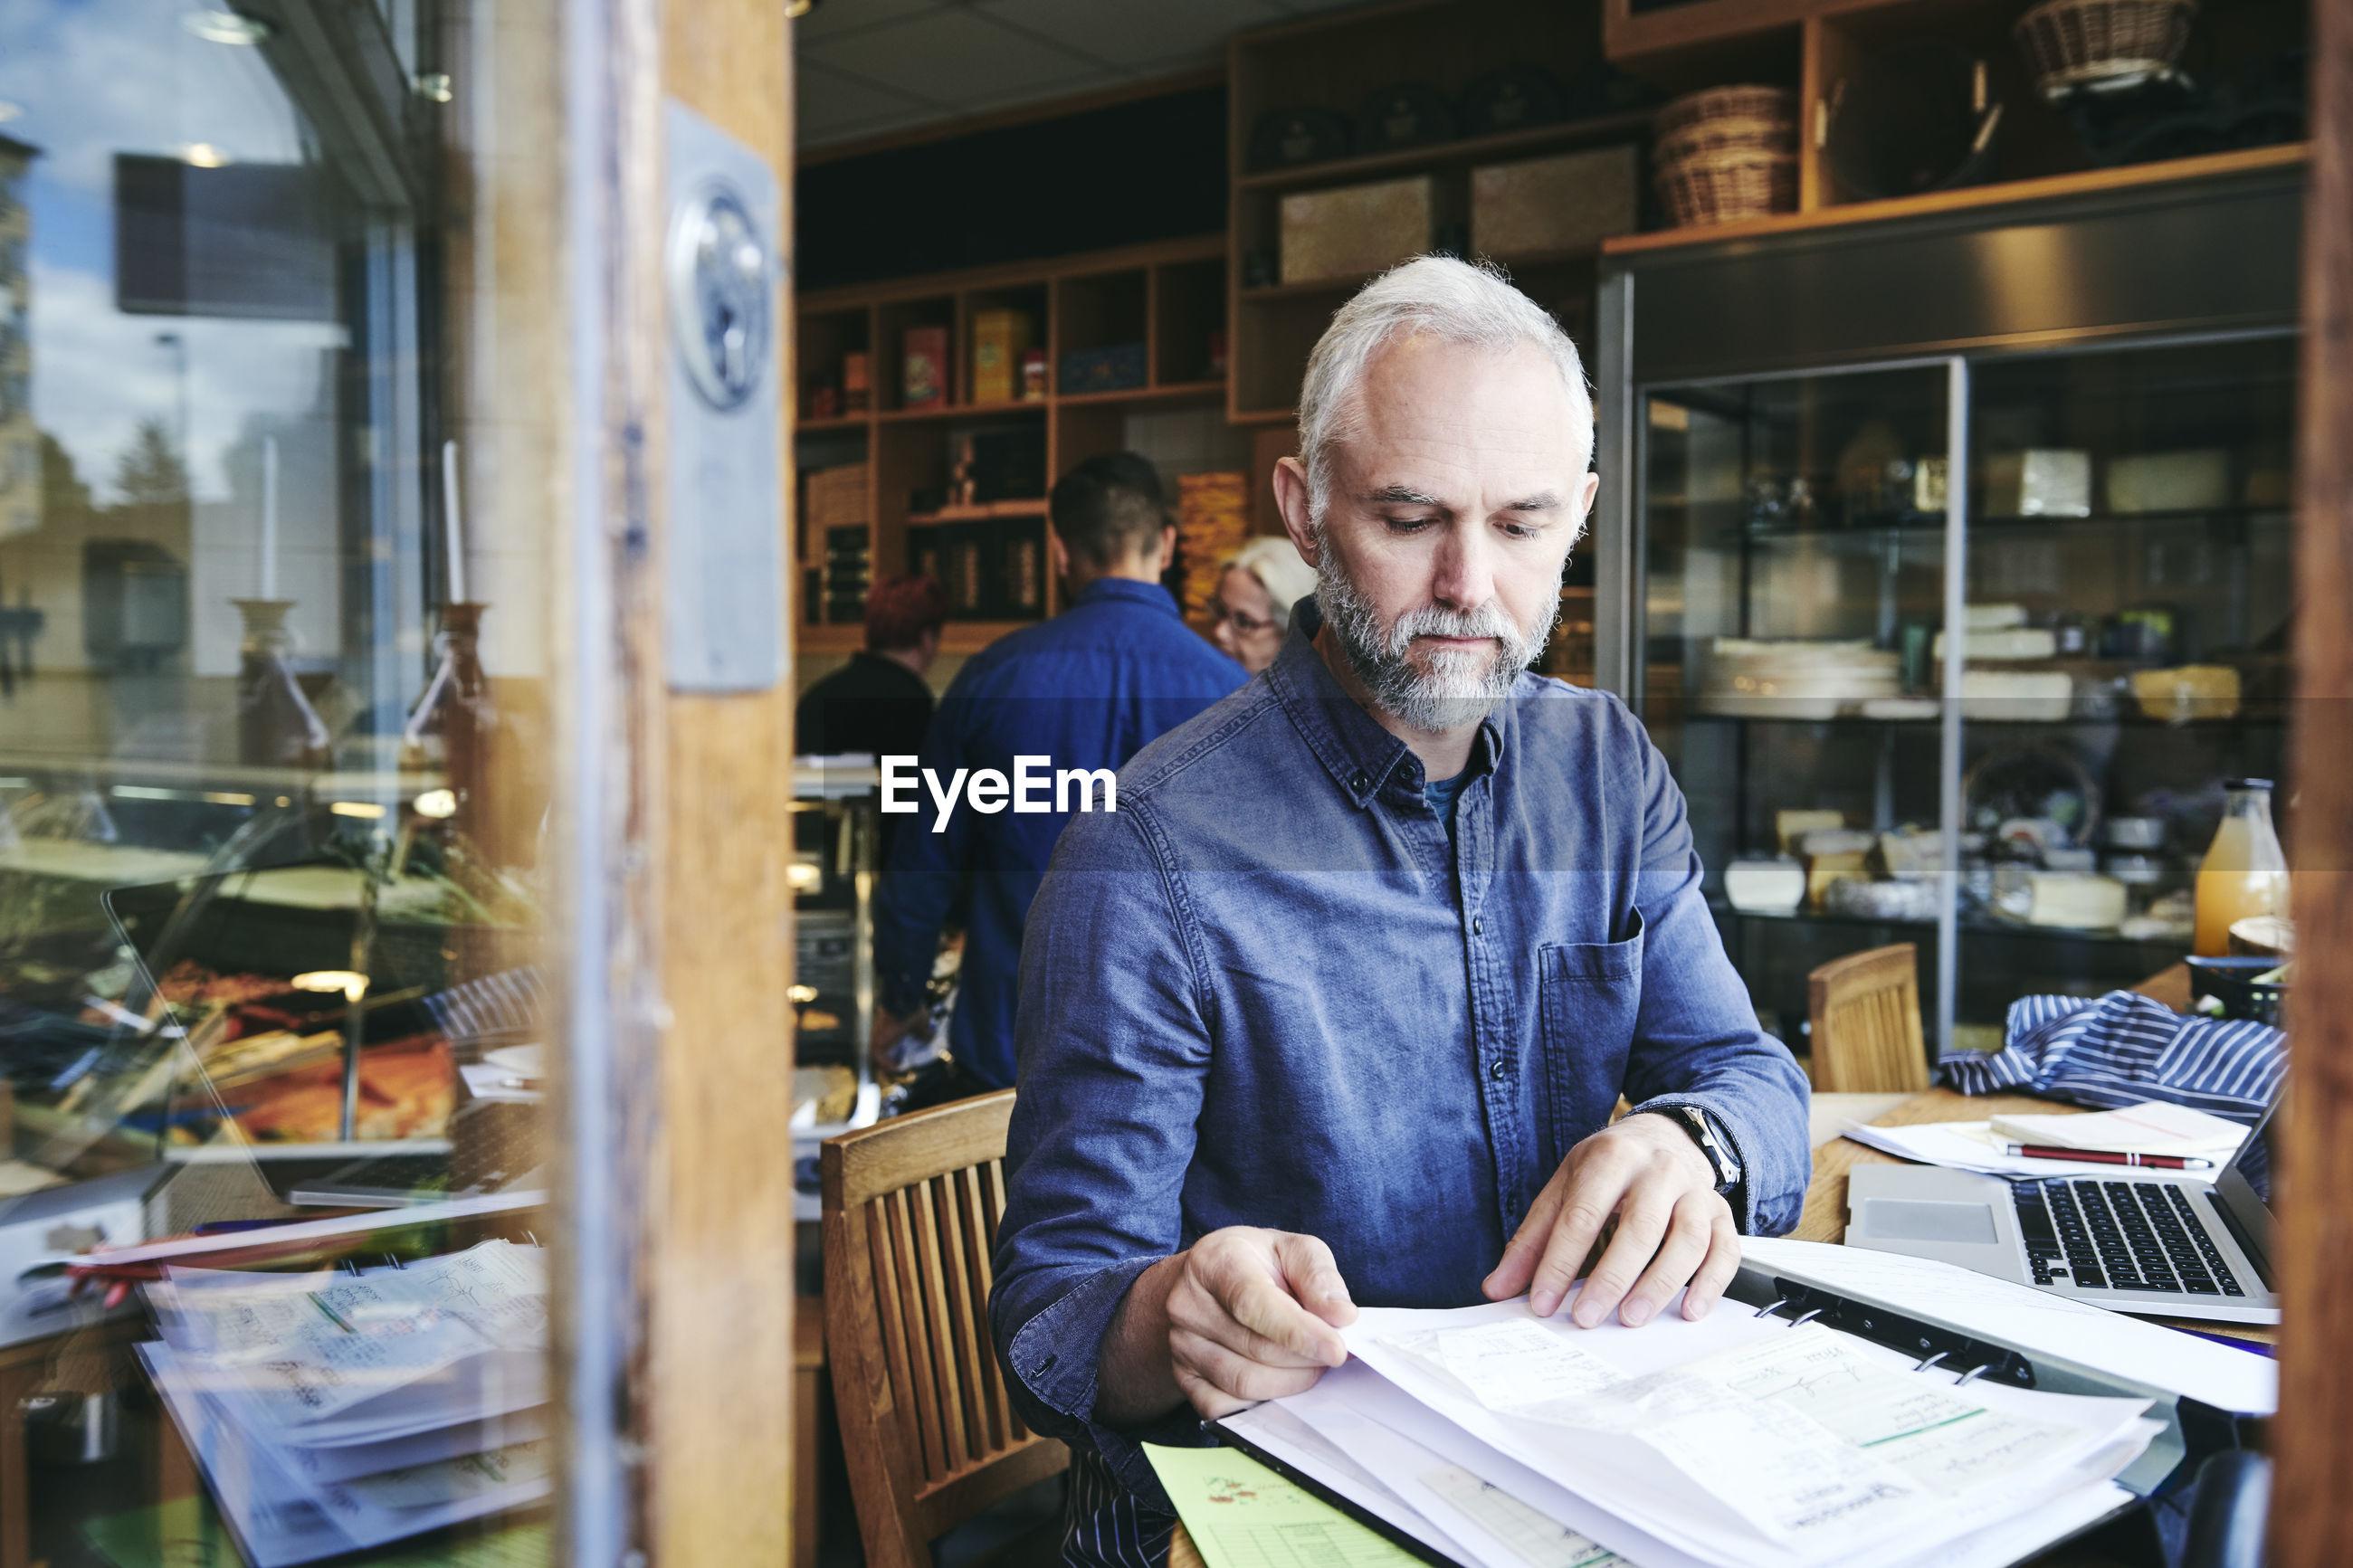 PORTRAIT OF A MAN WORKING IN OFFICE